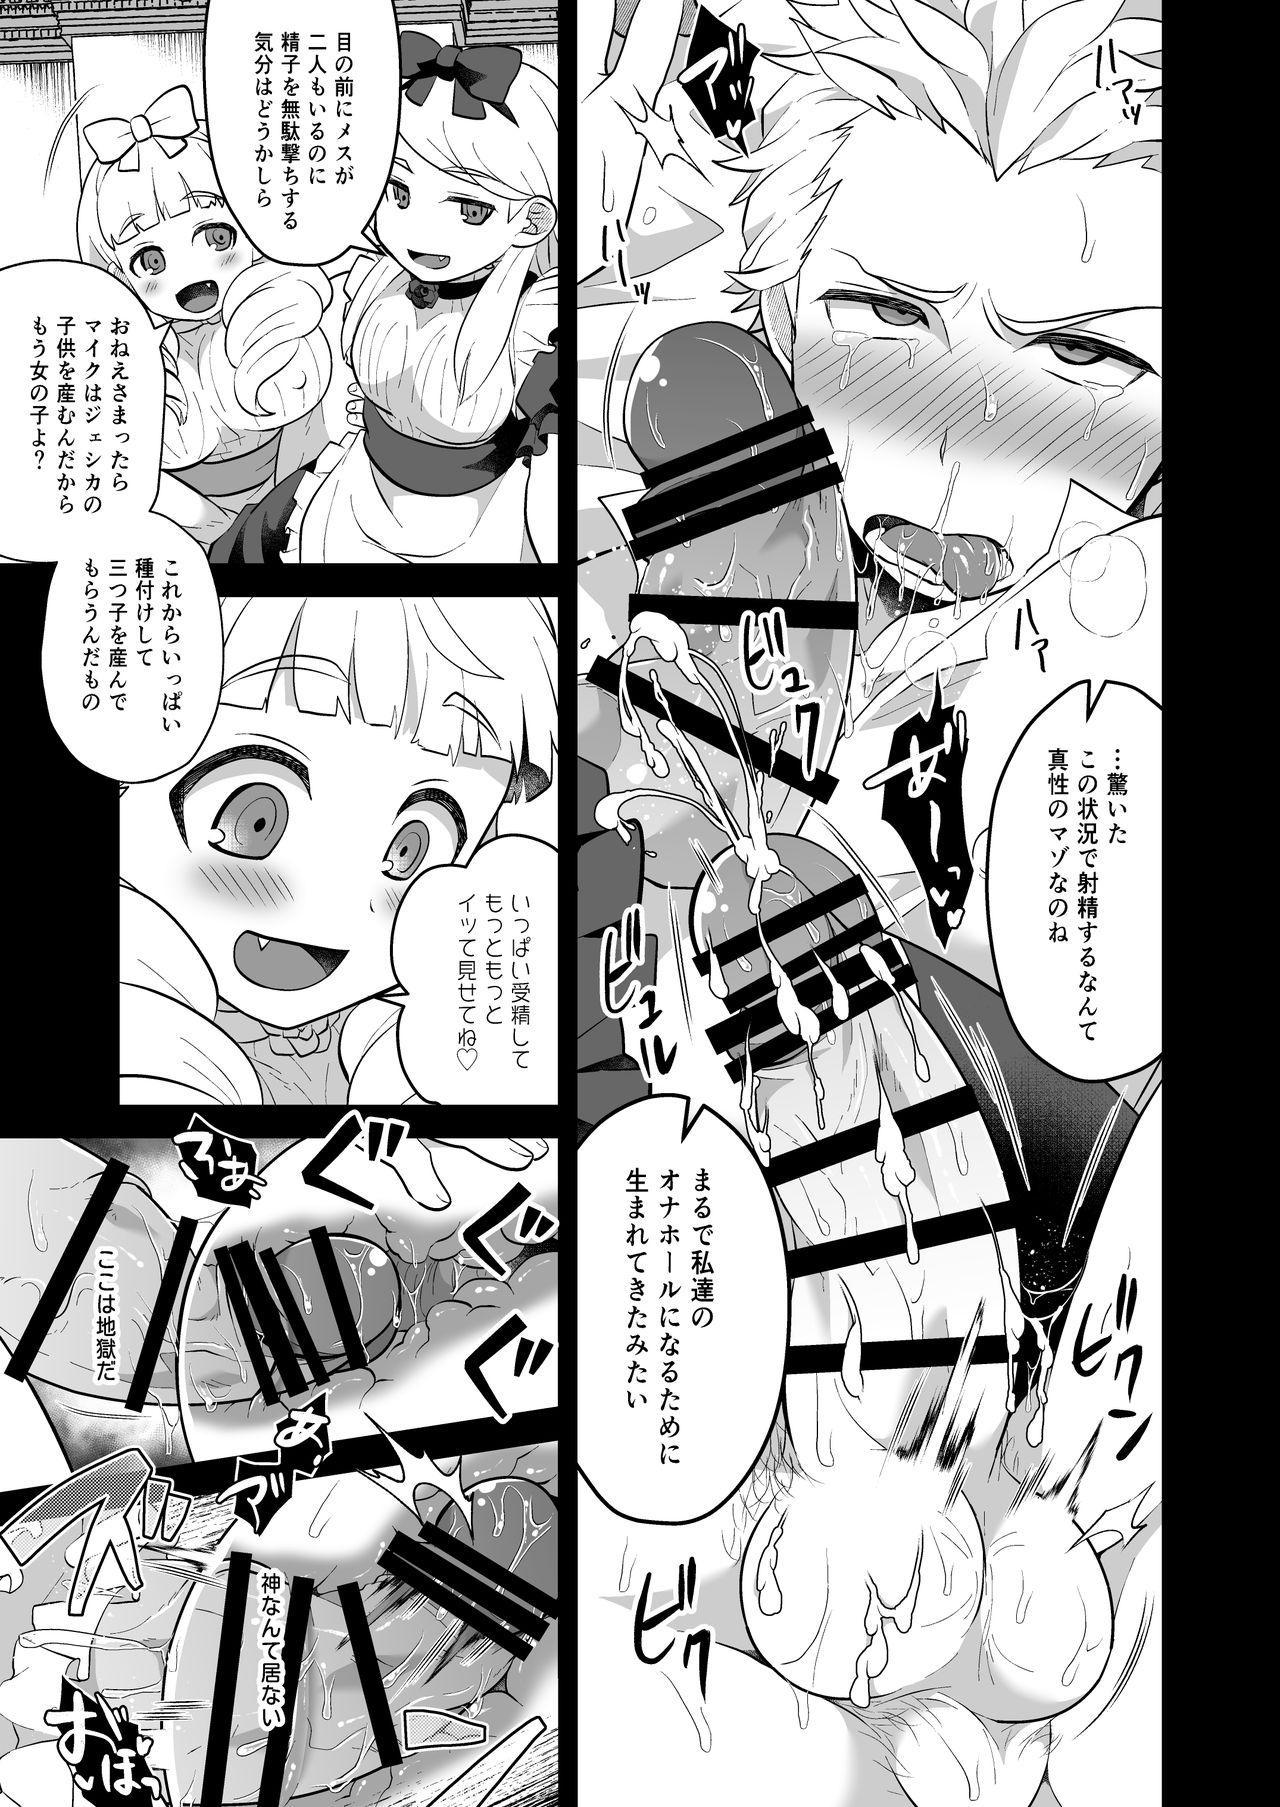 Onee-sama, Kore ga Hoshiino 14